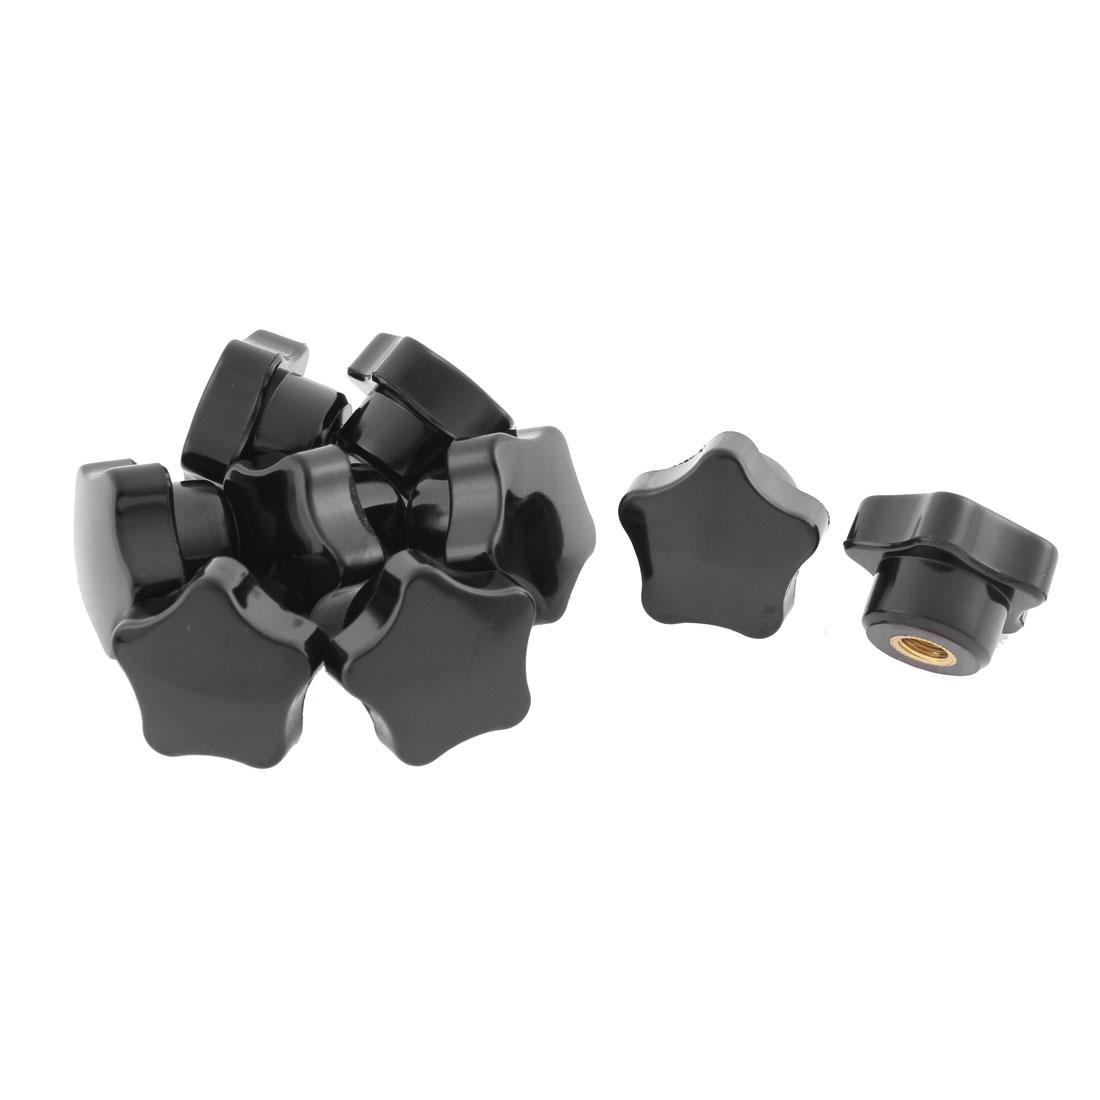 Plastic Star Head M6 x 32mm Female Thread Clamping Knob Black 9 Pcs